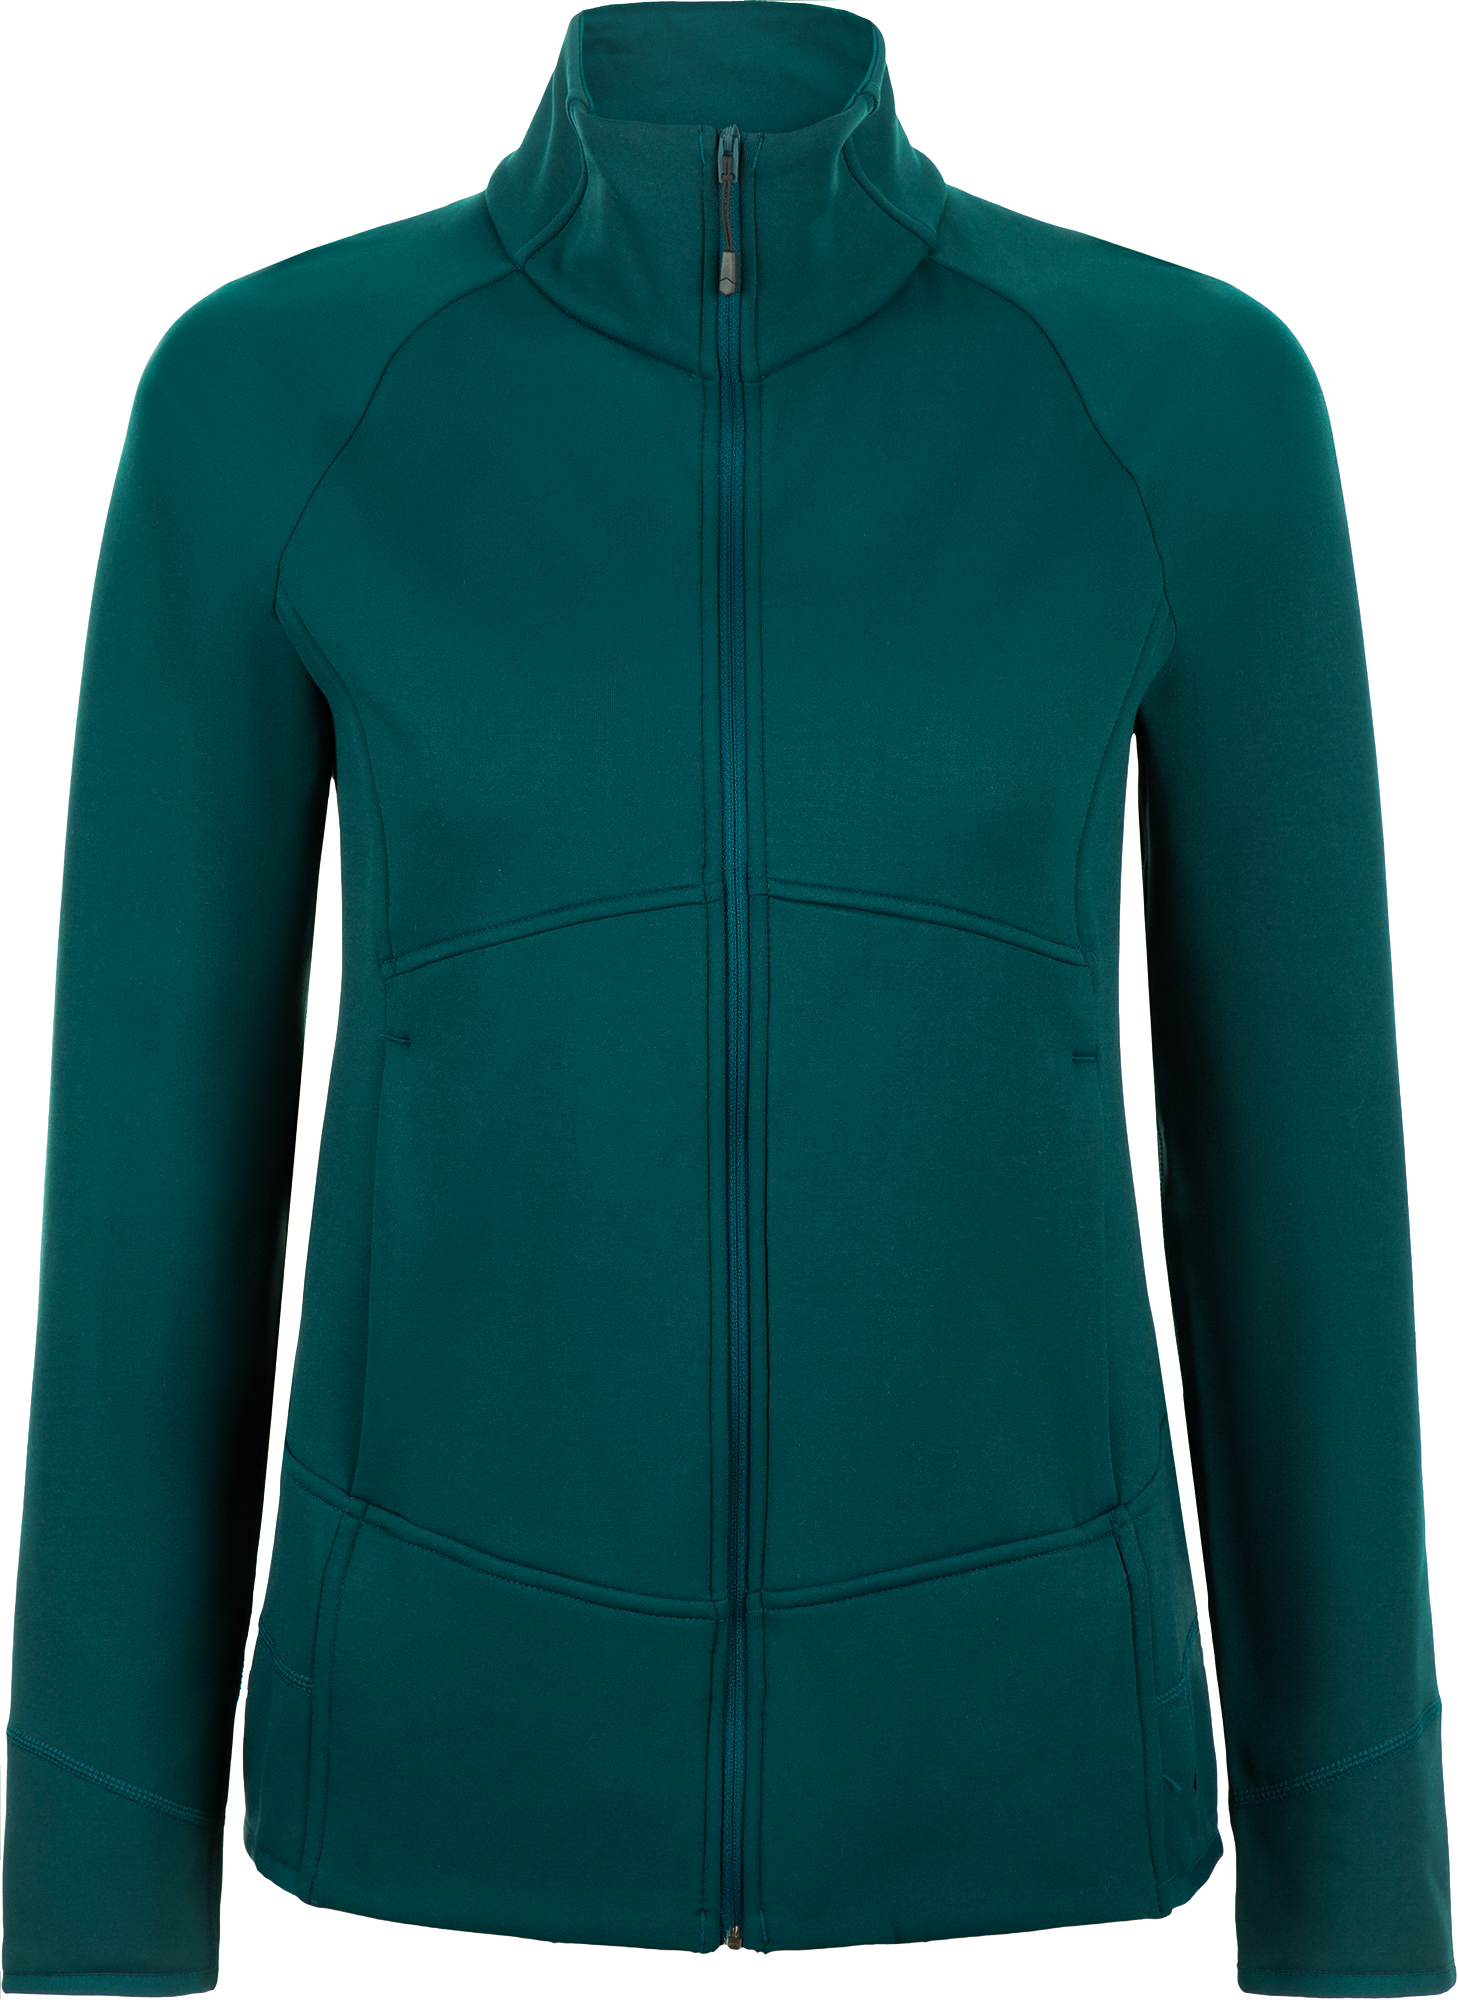 Mountain Hardwear Джемпер флисовый женский Mountain Hardwear Frostzone™, размер 42 цена в Москве и Питере